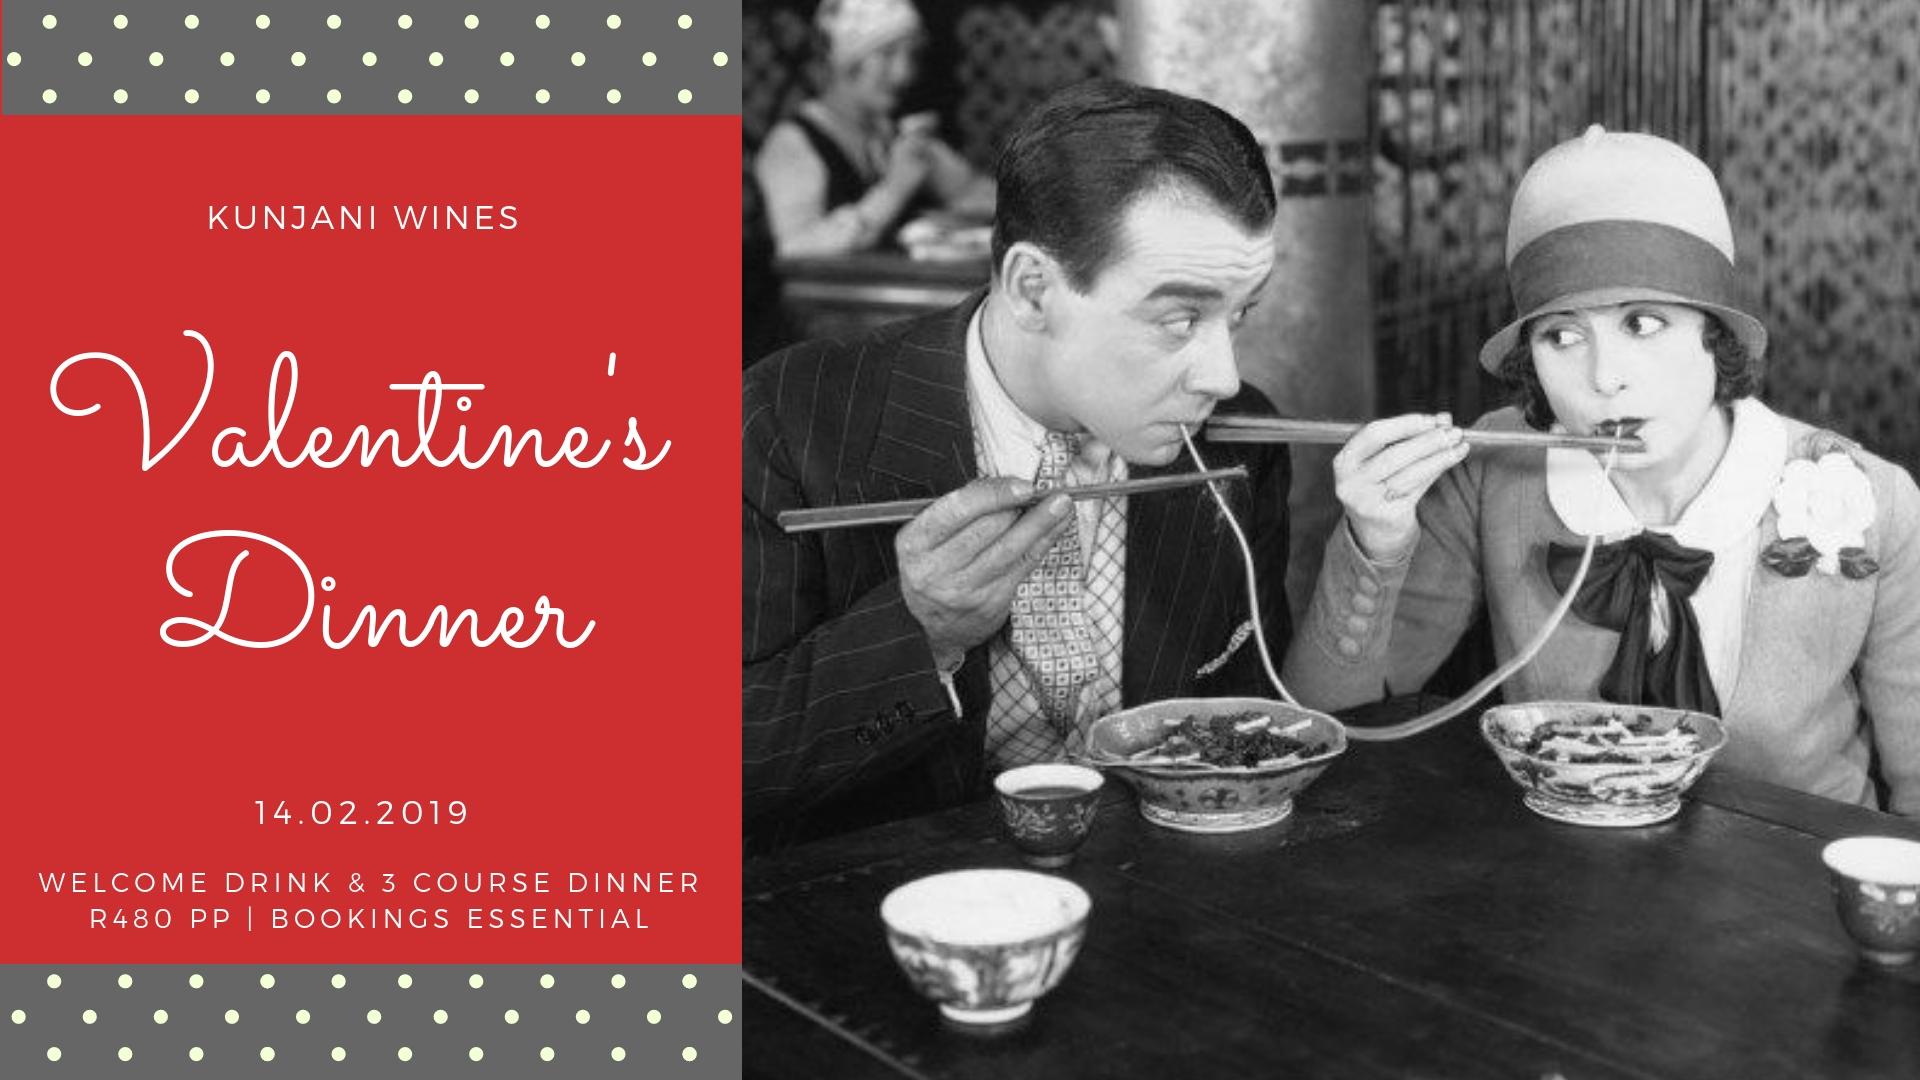 Old School Romance at Kunjani Wines this Valentine's Day photo